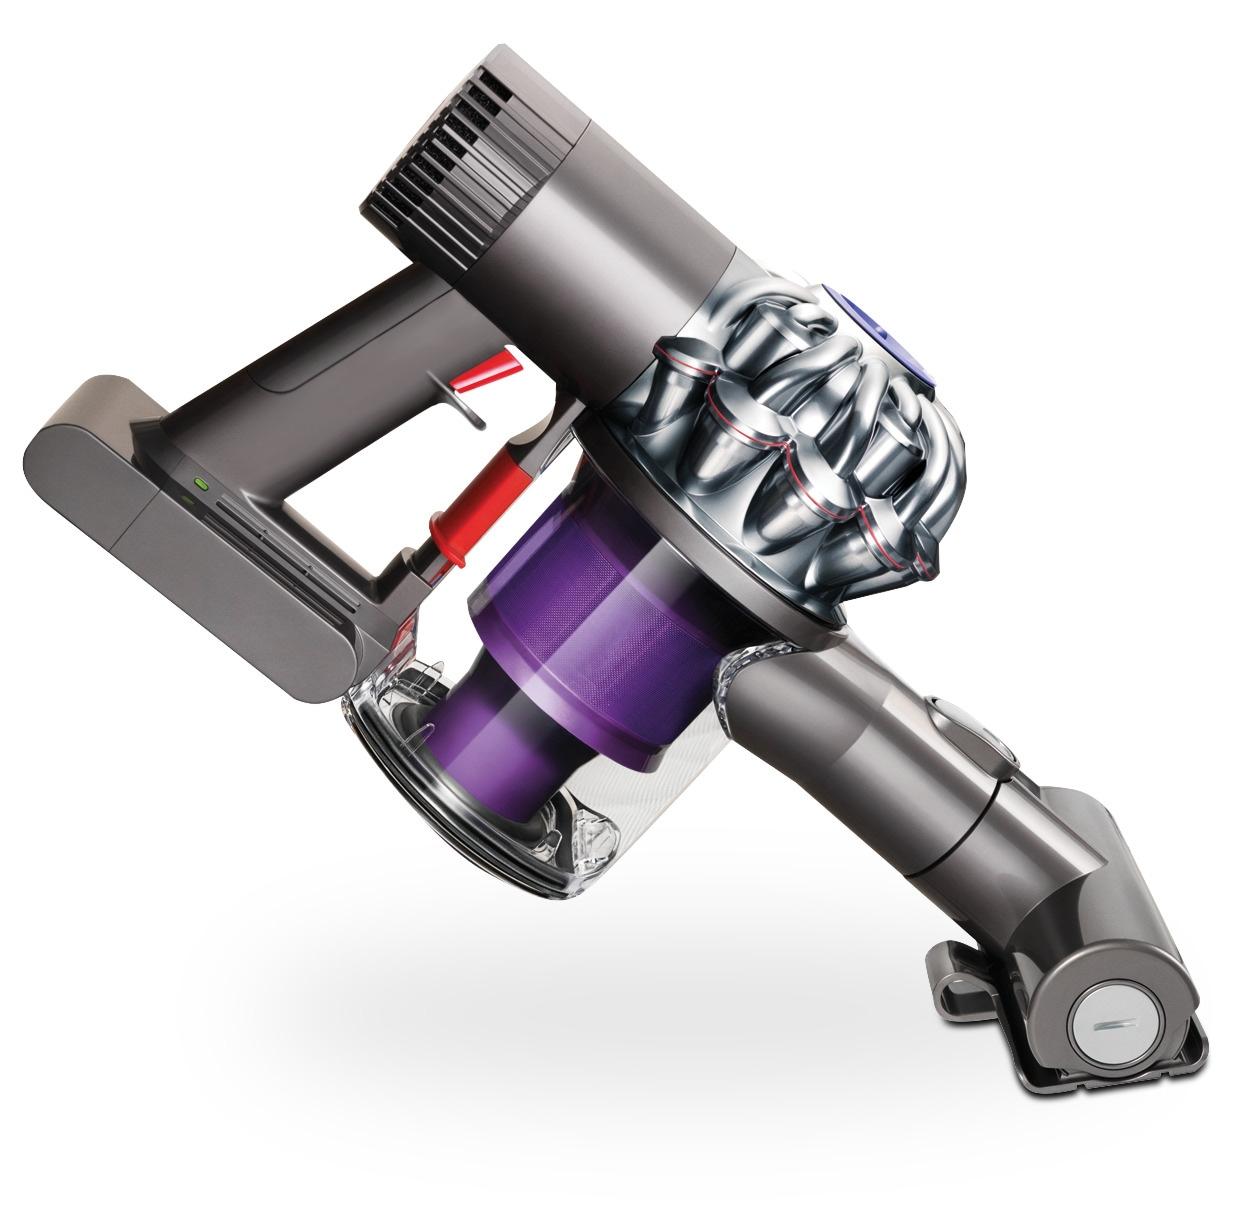 Dyson V6 Trigger Handheld Vacuum – 231861-01